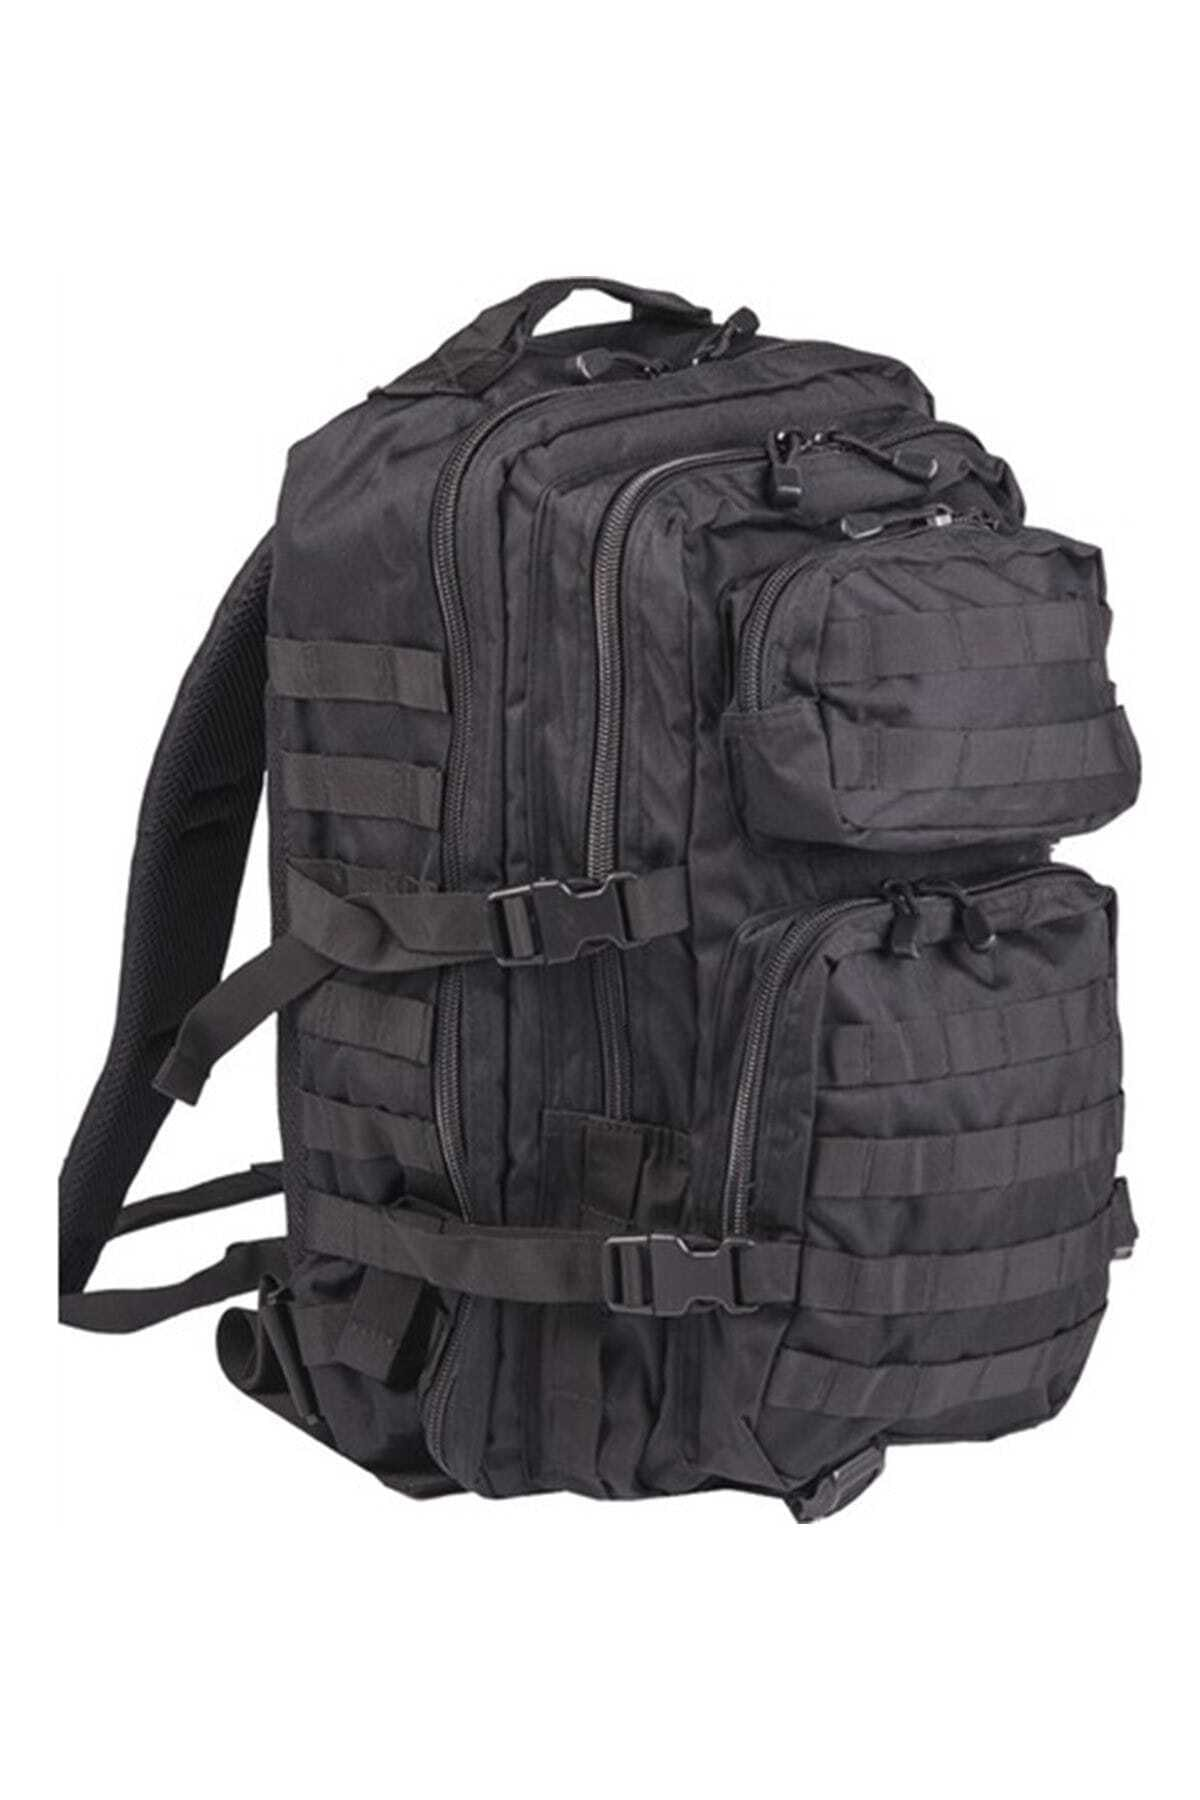 Mil-Tec Unisex Outdoor Ve Taktikal 36lt Çanta 14002202 Siyah 1